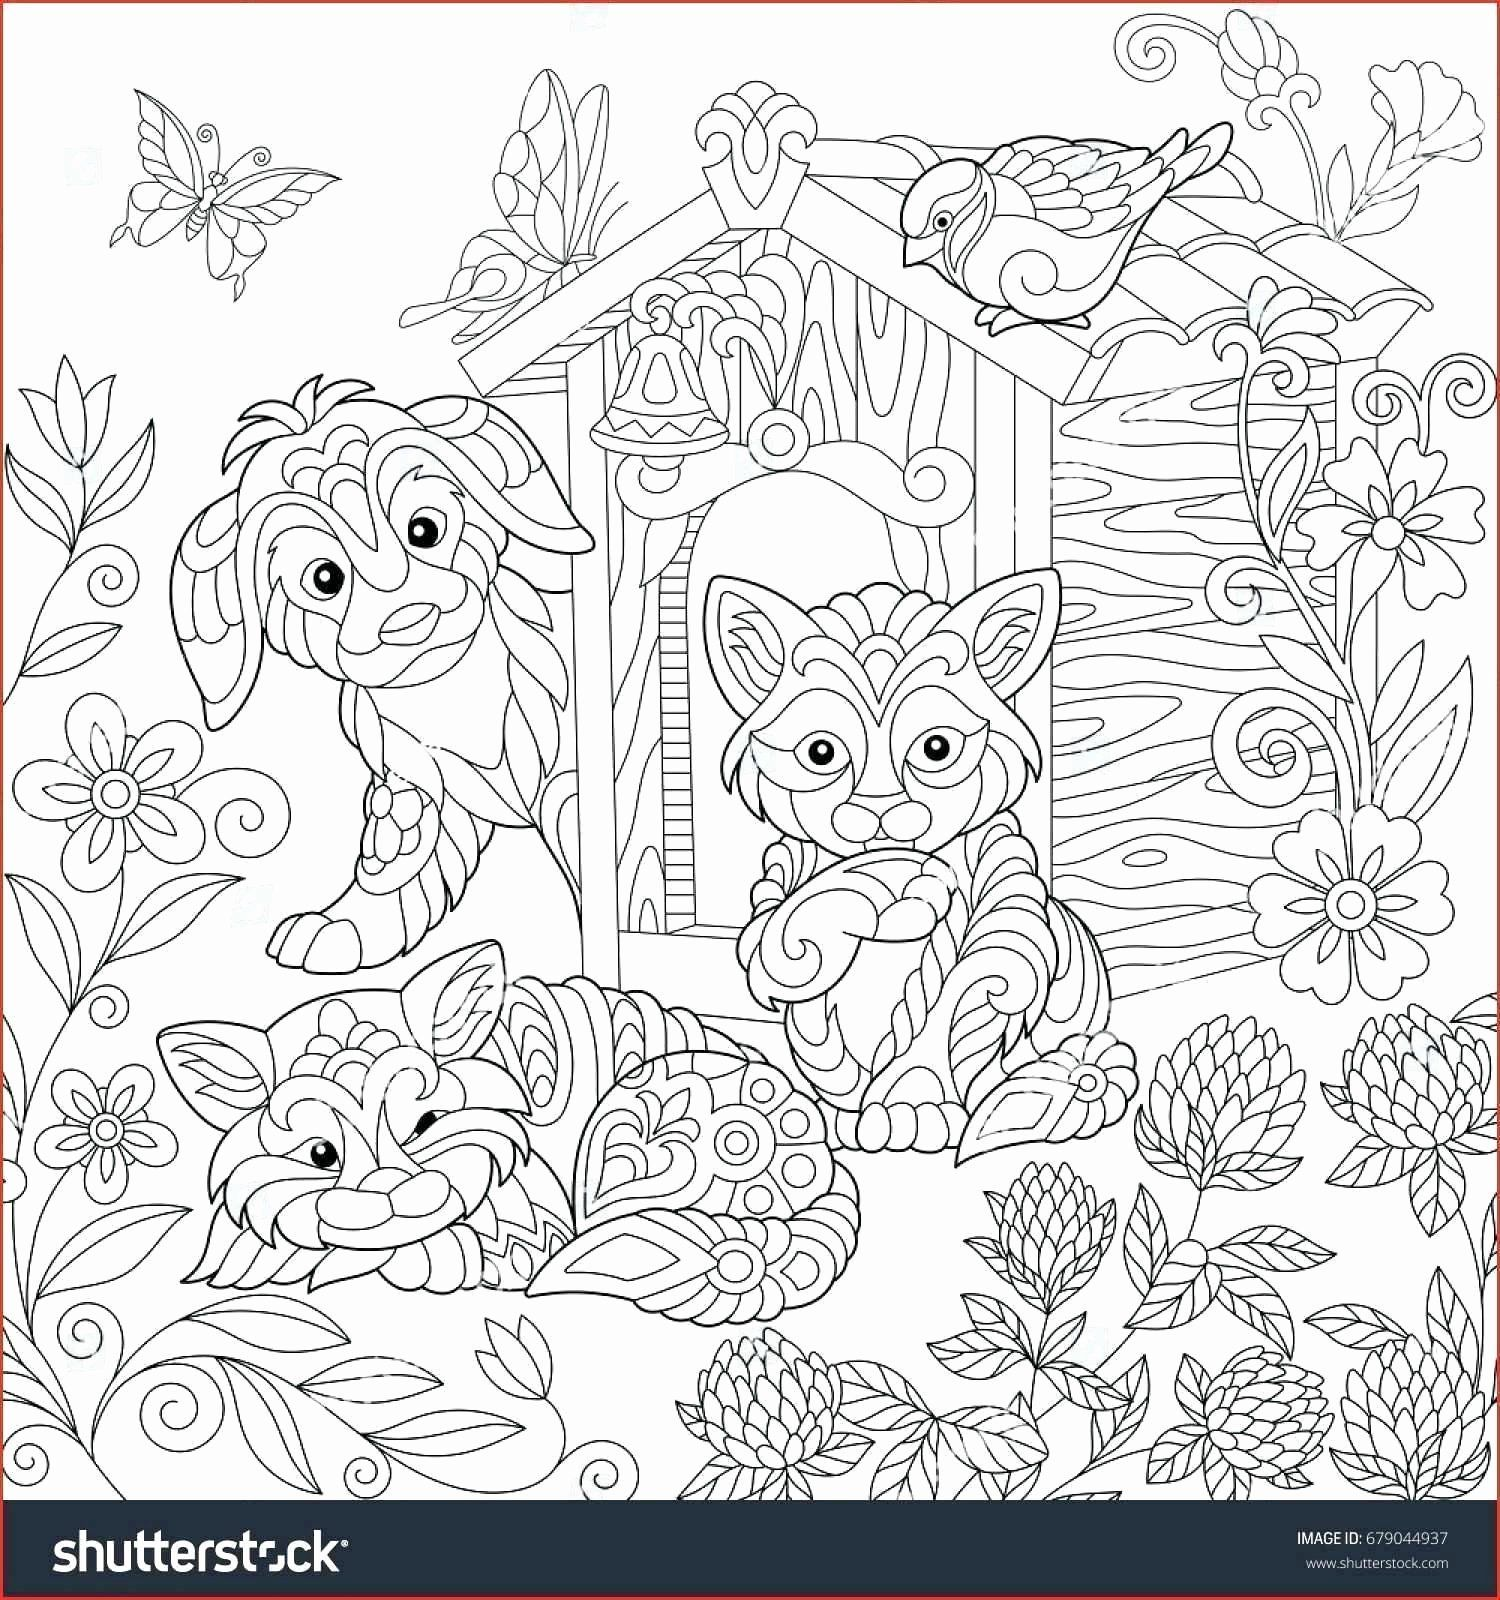 Coloring Sheets Cute Animals Elegant Pitbull Coloring Page Maximosheet Cat Coloring Page Puppy Coloring Pages Dog Coloring Page